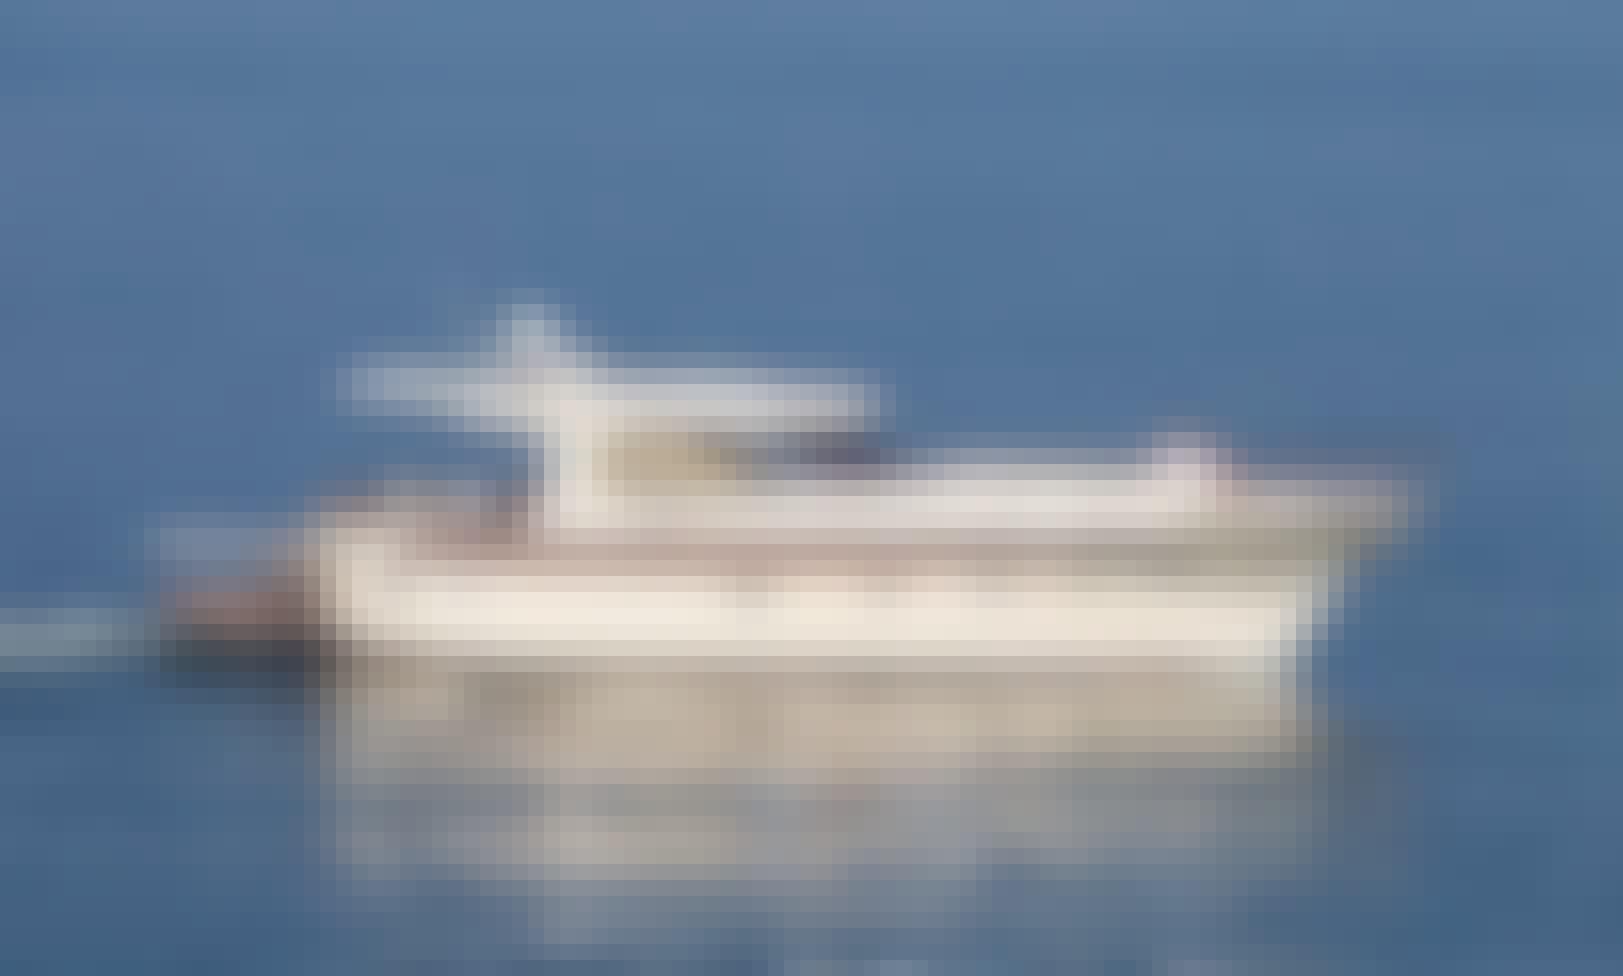 Sorrento 50 Gozzo Yacht Rental in Piano di Sorrento, Campania